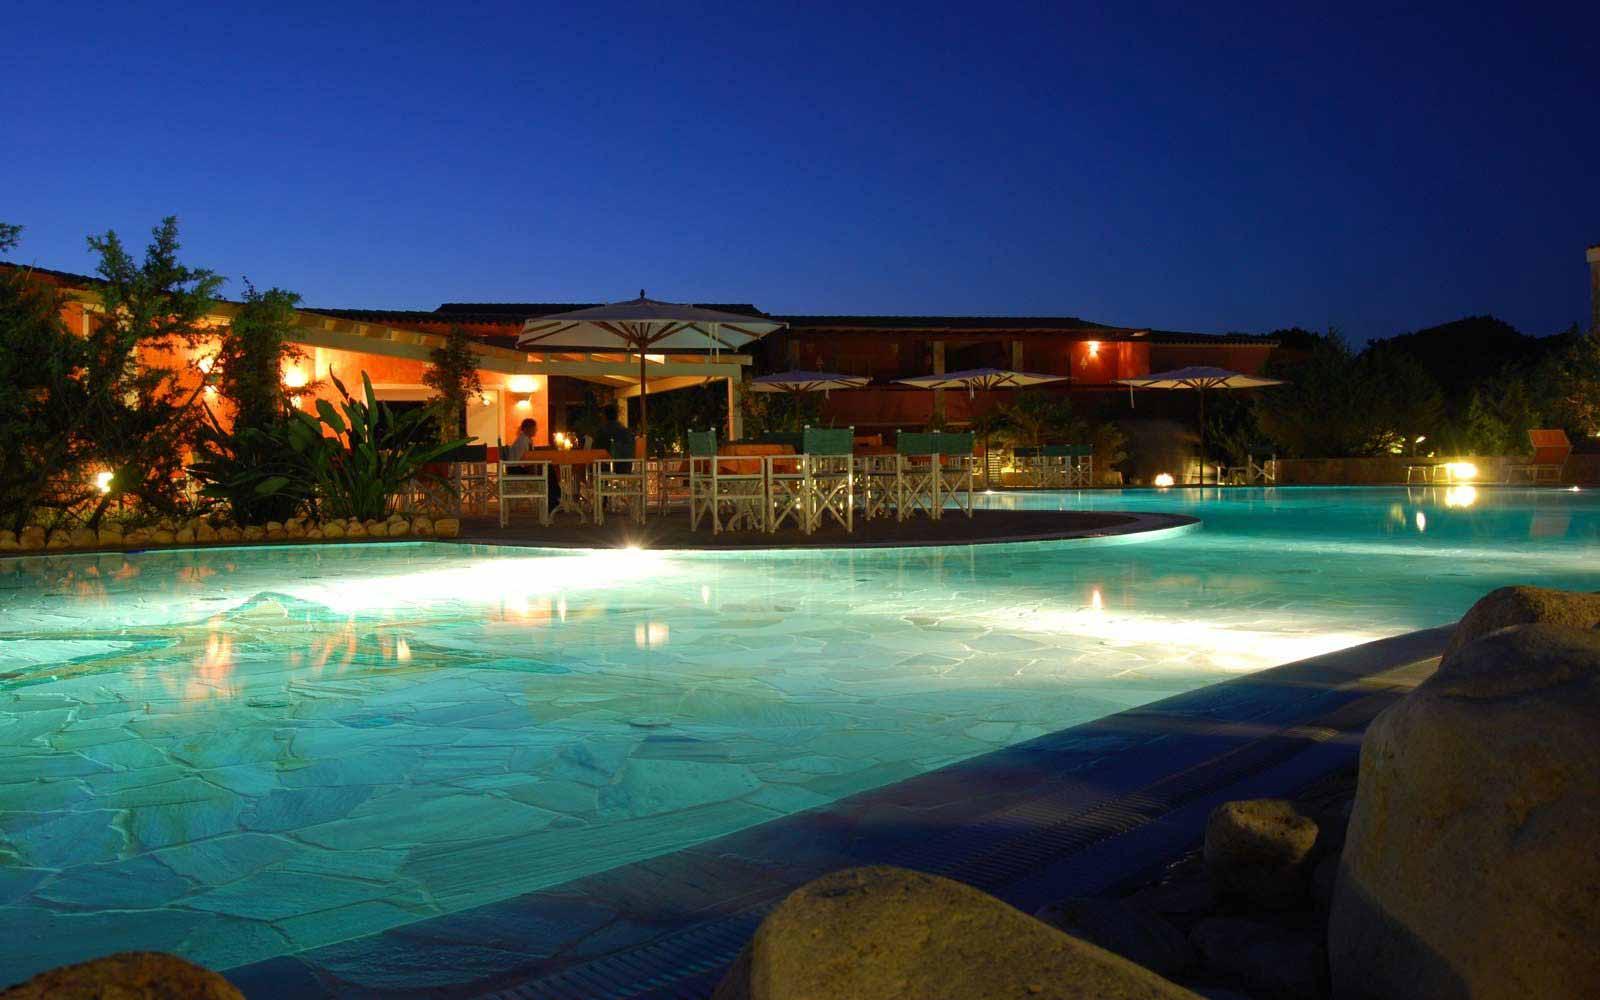 Resort & Spa Le Dune- Hotel & Spa Le Sabine